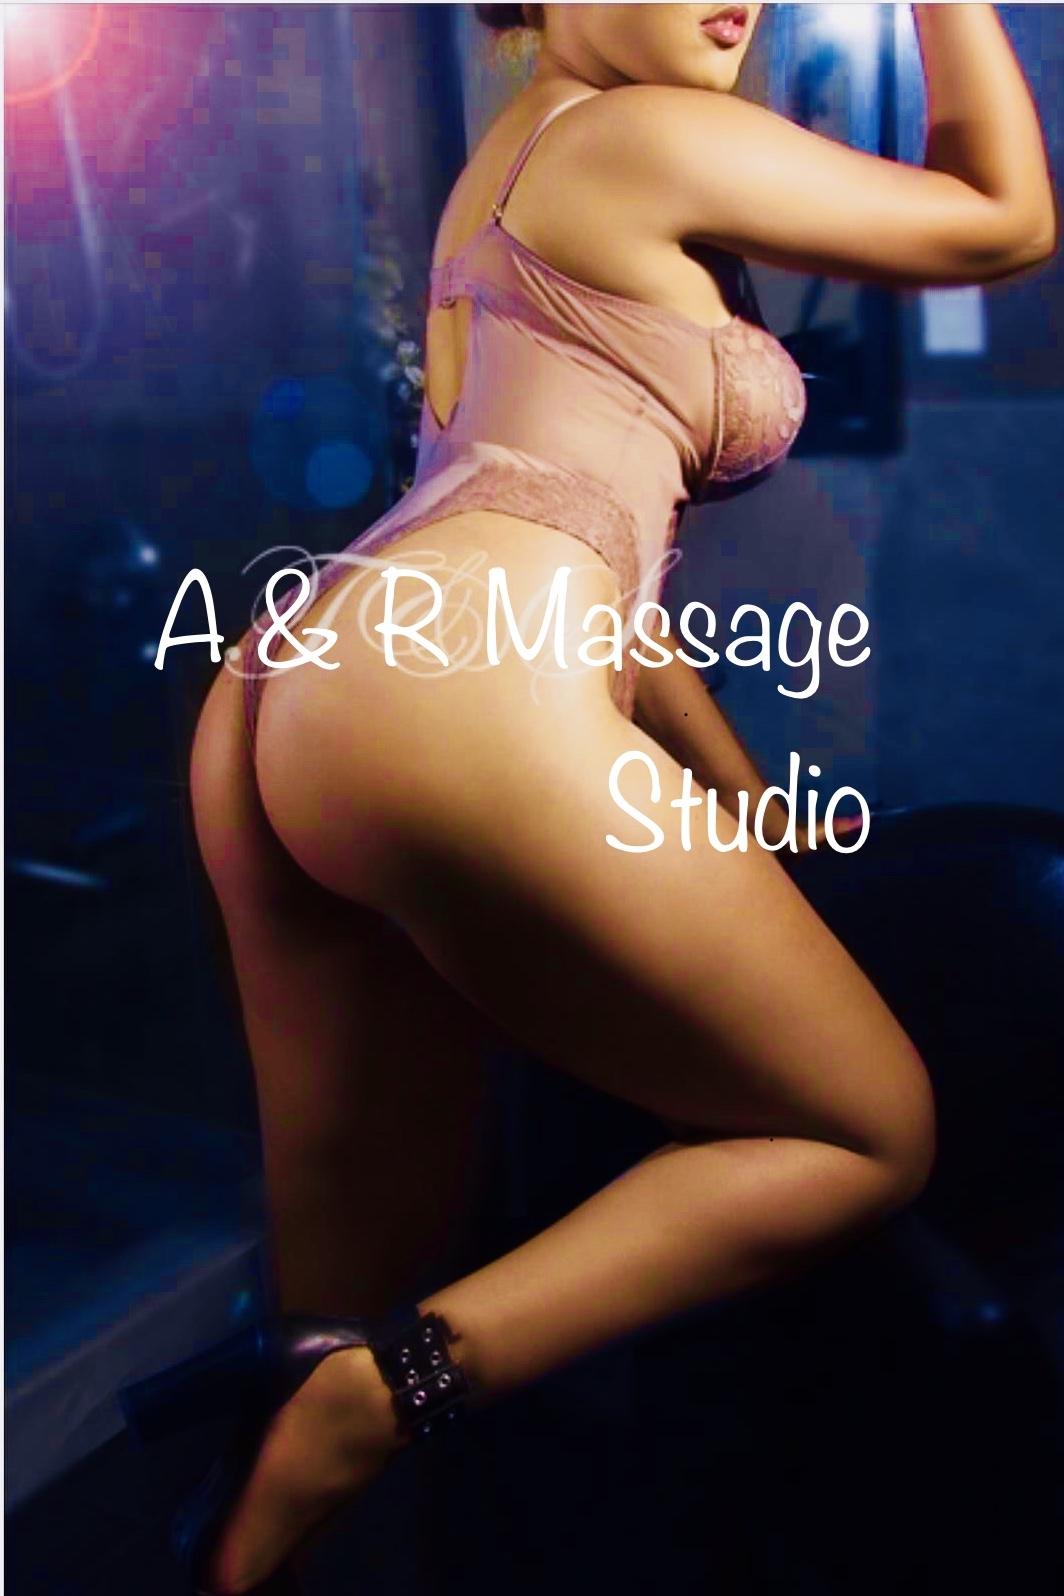 ★* UltimatePlaymate.com *★★•NAUGHTY ★•CUM MAKE YOUR CHOICE •★ NO RUSH •★FEEL ROYAL •★A&R MASSAGE STUDIO-416-760-8555